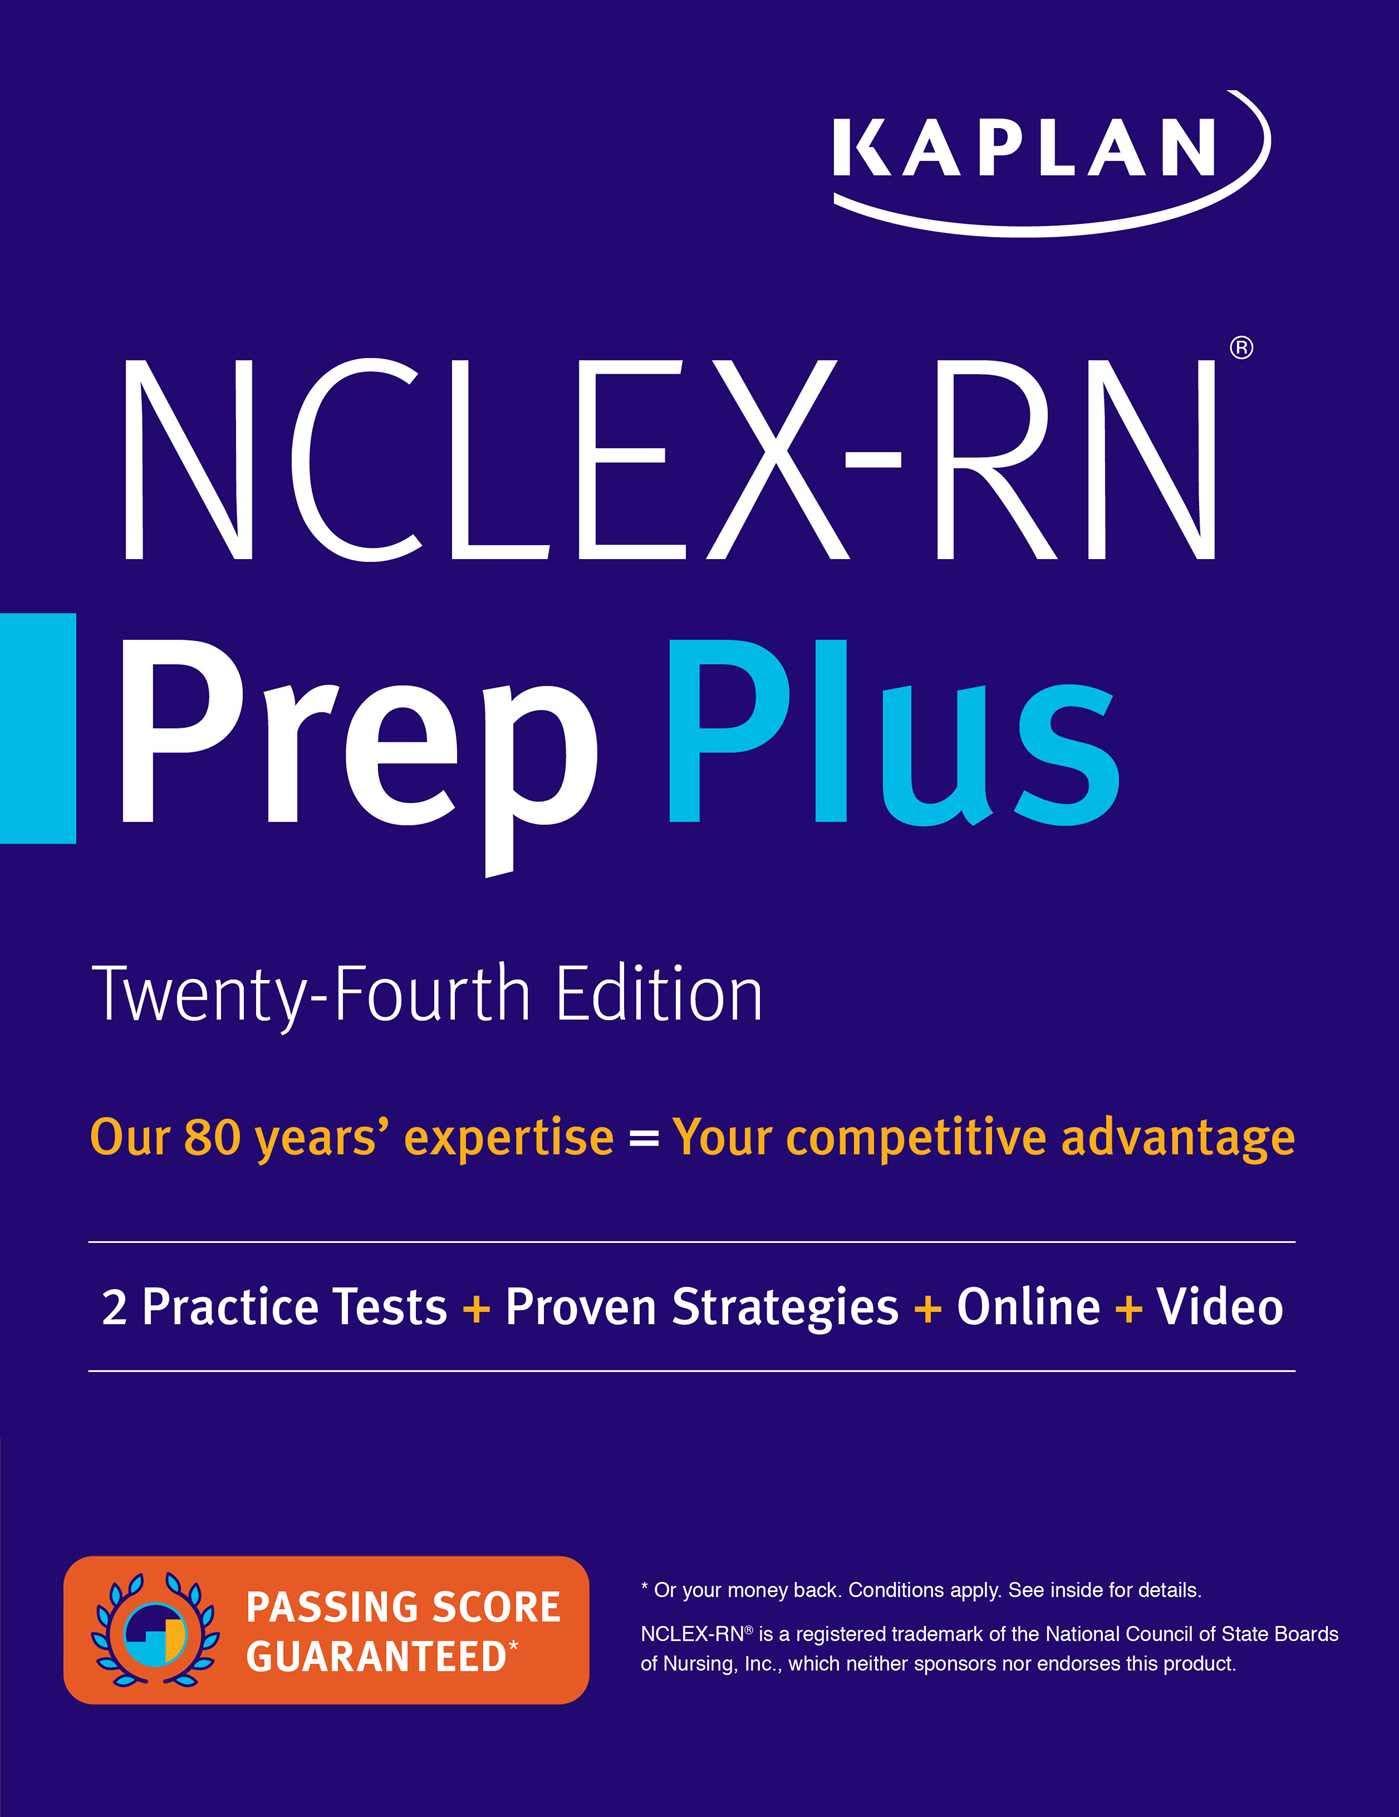 NCLEX-RN Prep Plus (Practice Tests + Proven Strategies + Online + Video) (Kaplan Test Prep)